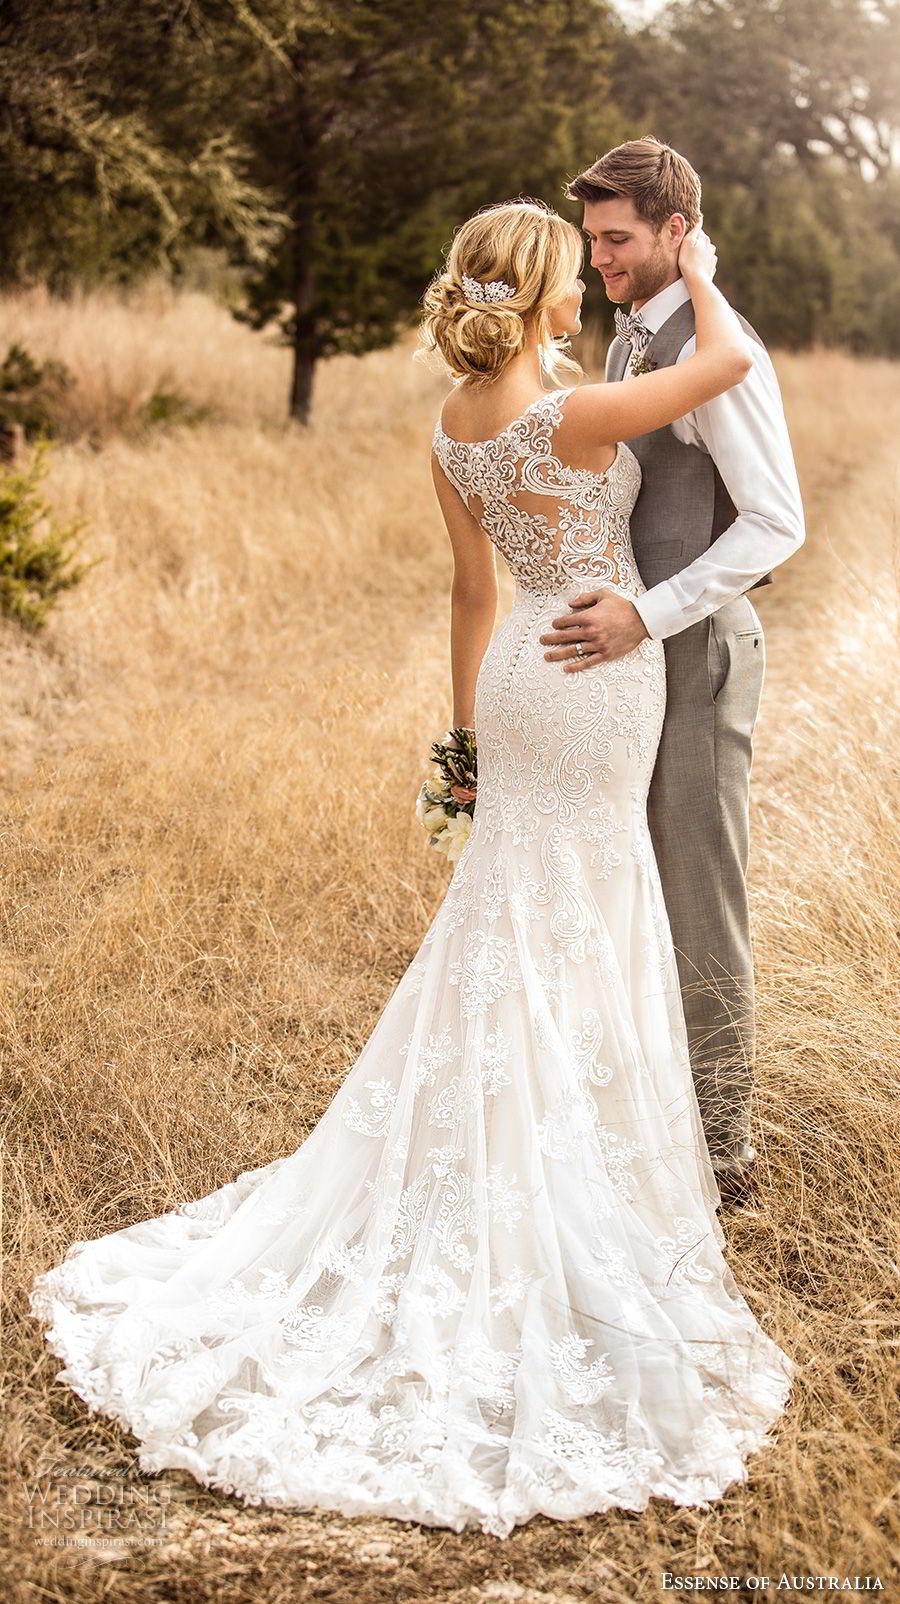 essense of australia wedding dresses prices photo - 1